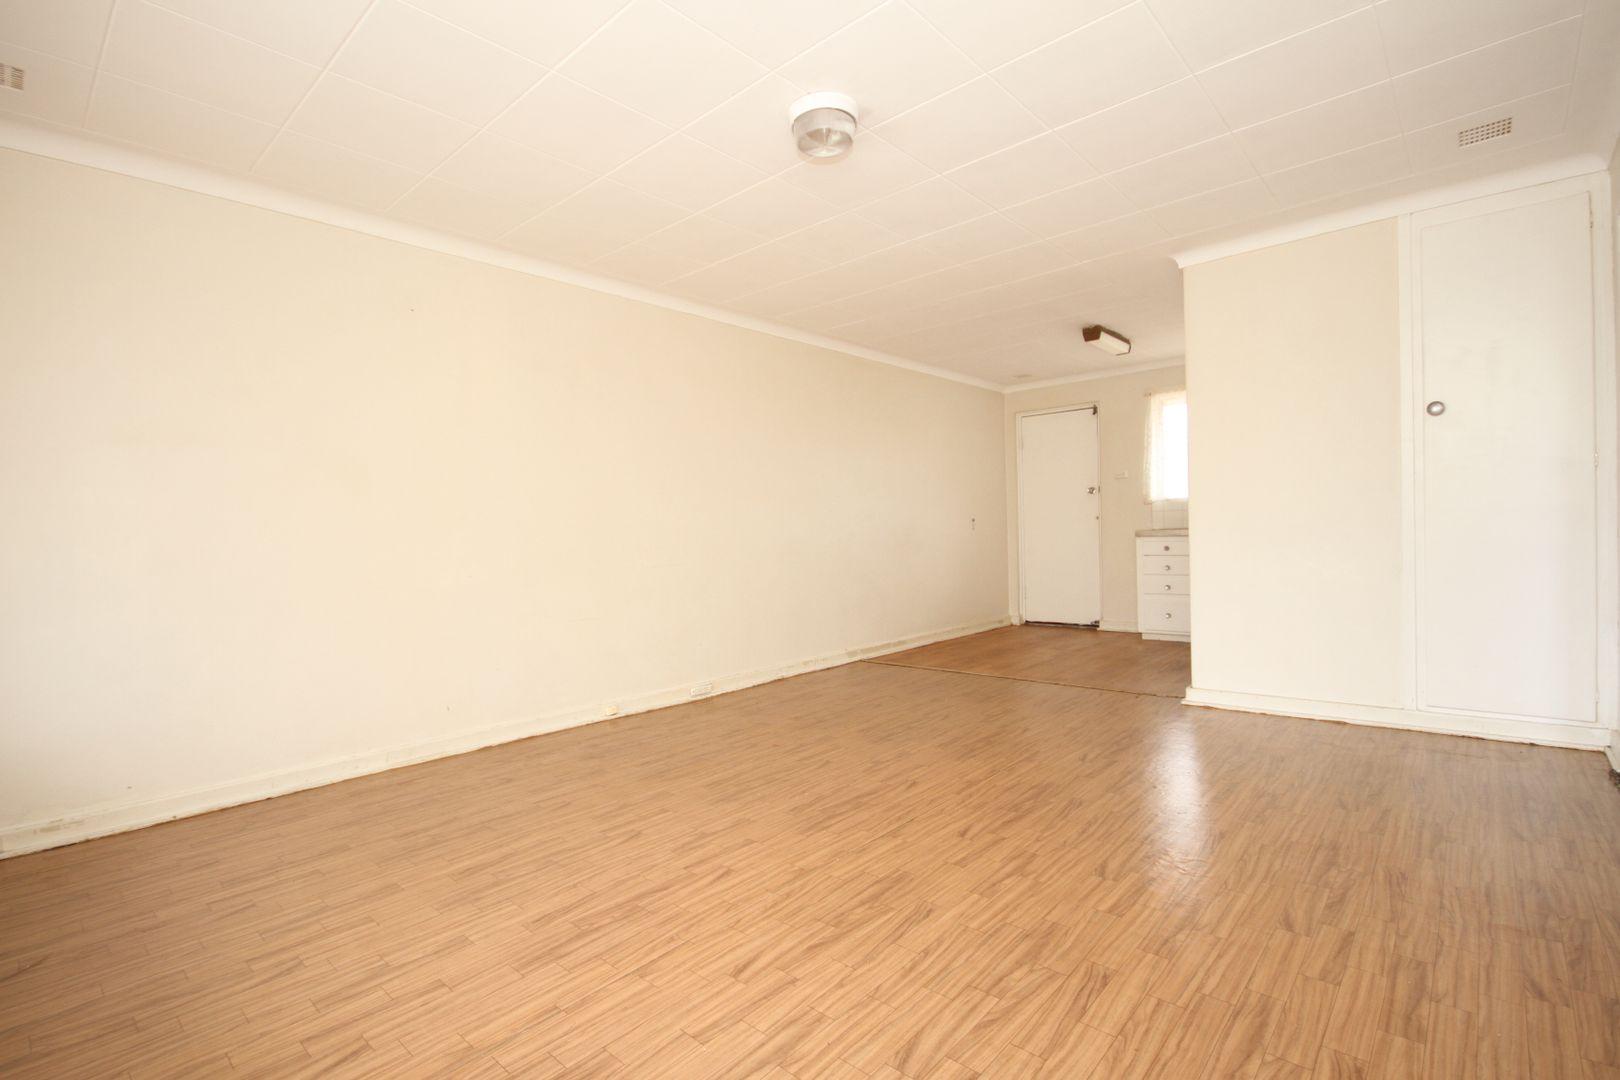 8/141 Augustus Street, Geraldton WA 6530, Image 2